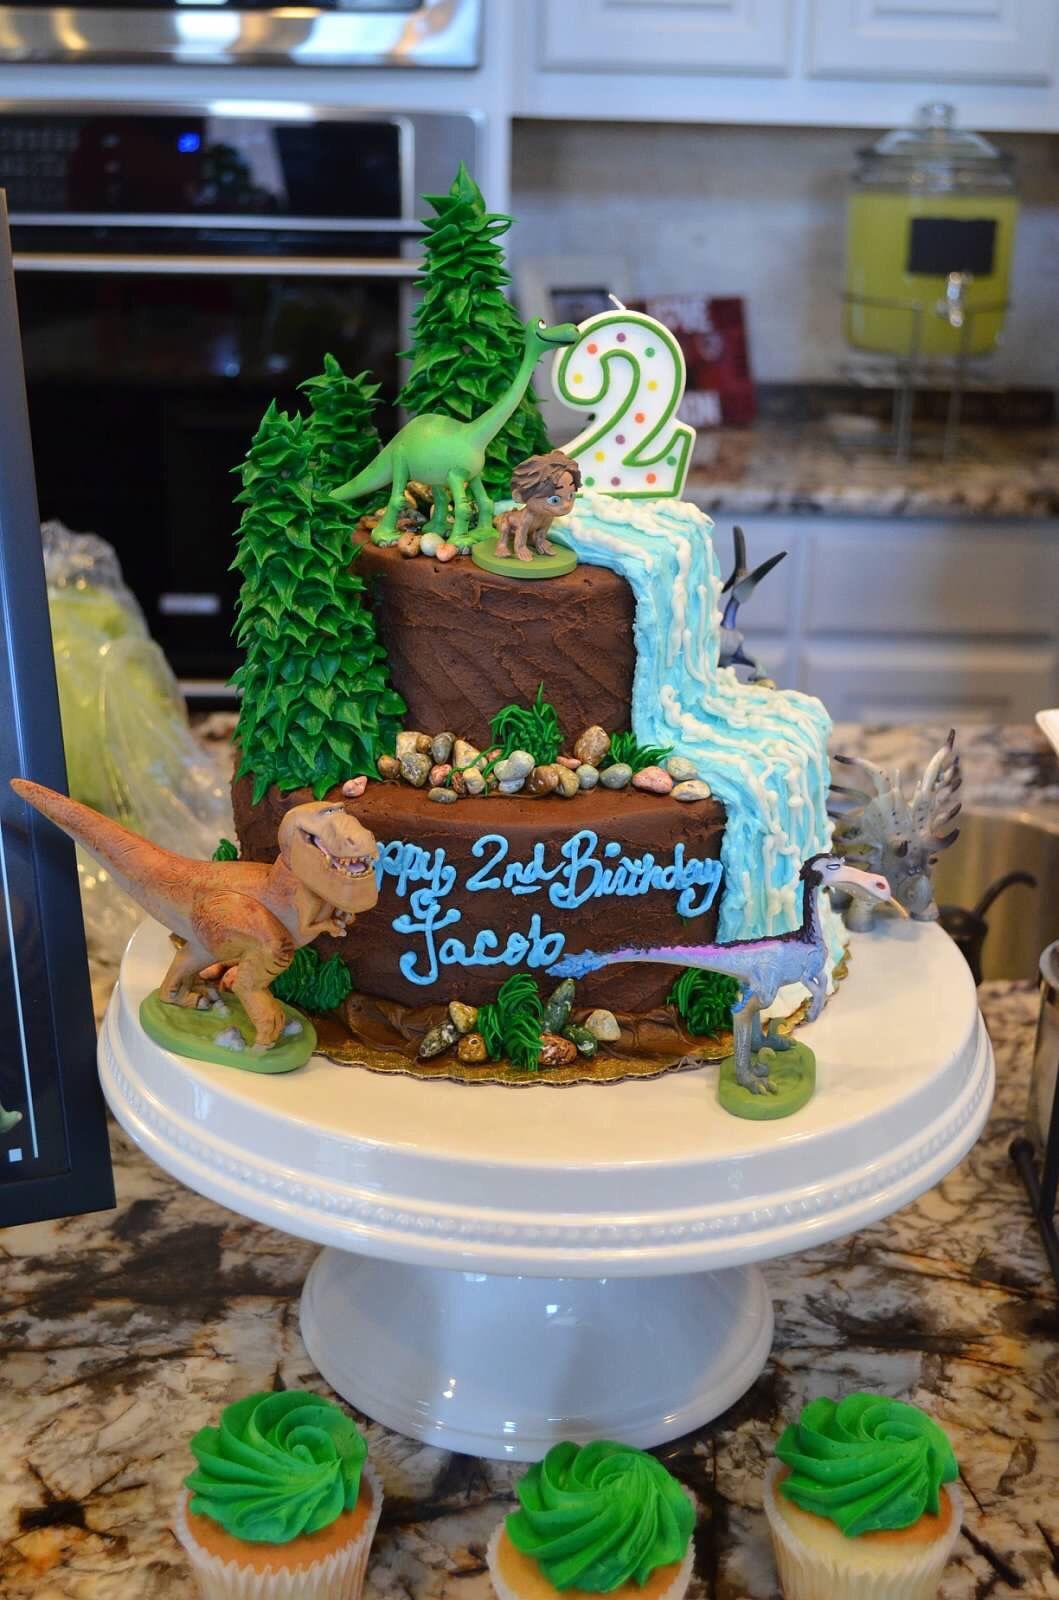 Good Dinosaur Cake Decorations : 857bdcc4cf735a572edc5dbc96e08c56.jpg 1,059x1,600 pixels ...